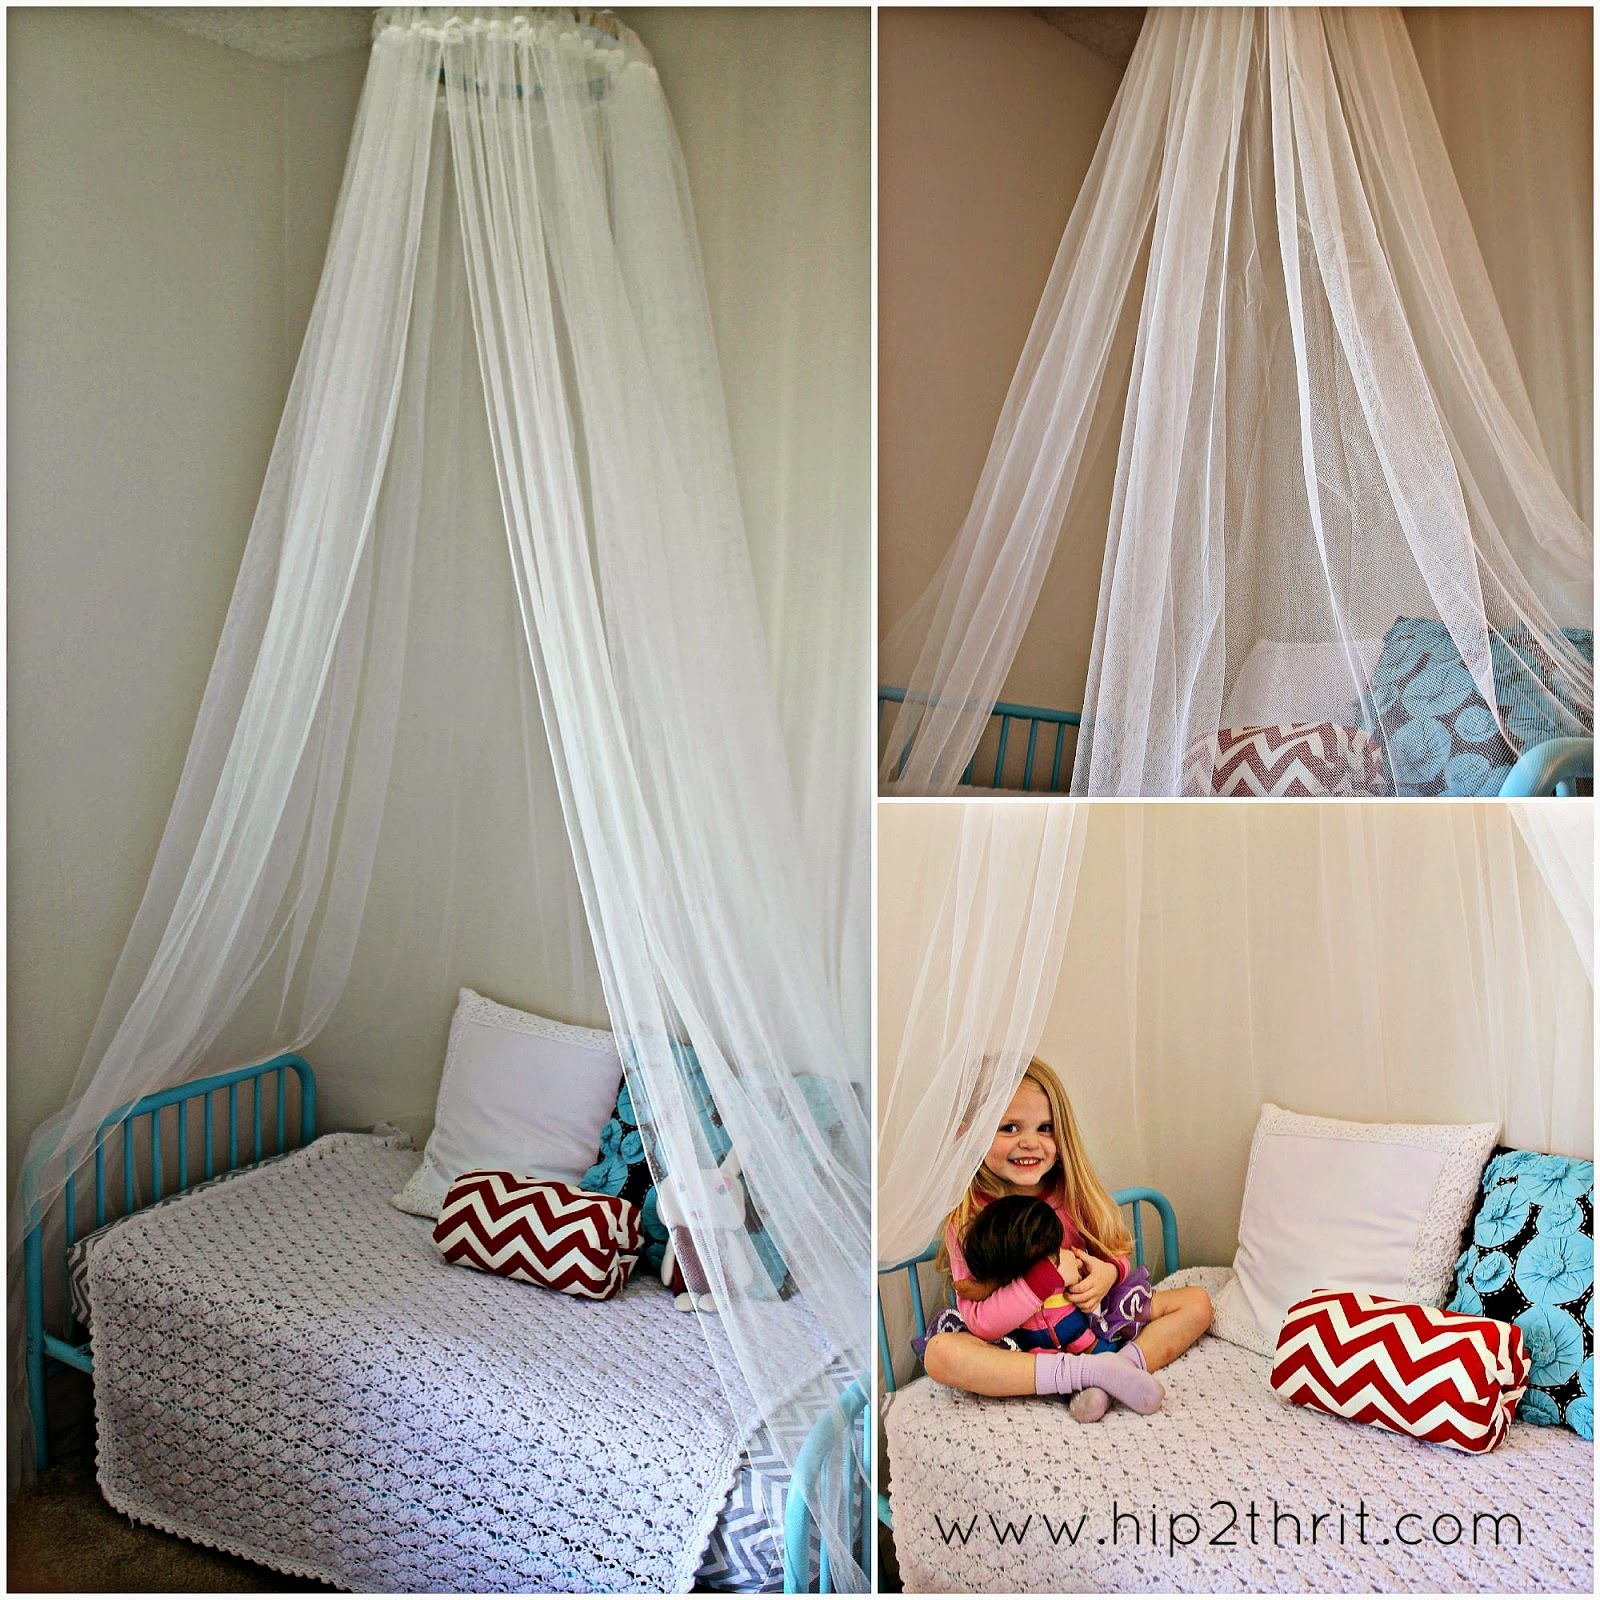 Как сделать балдахин кровати